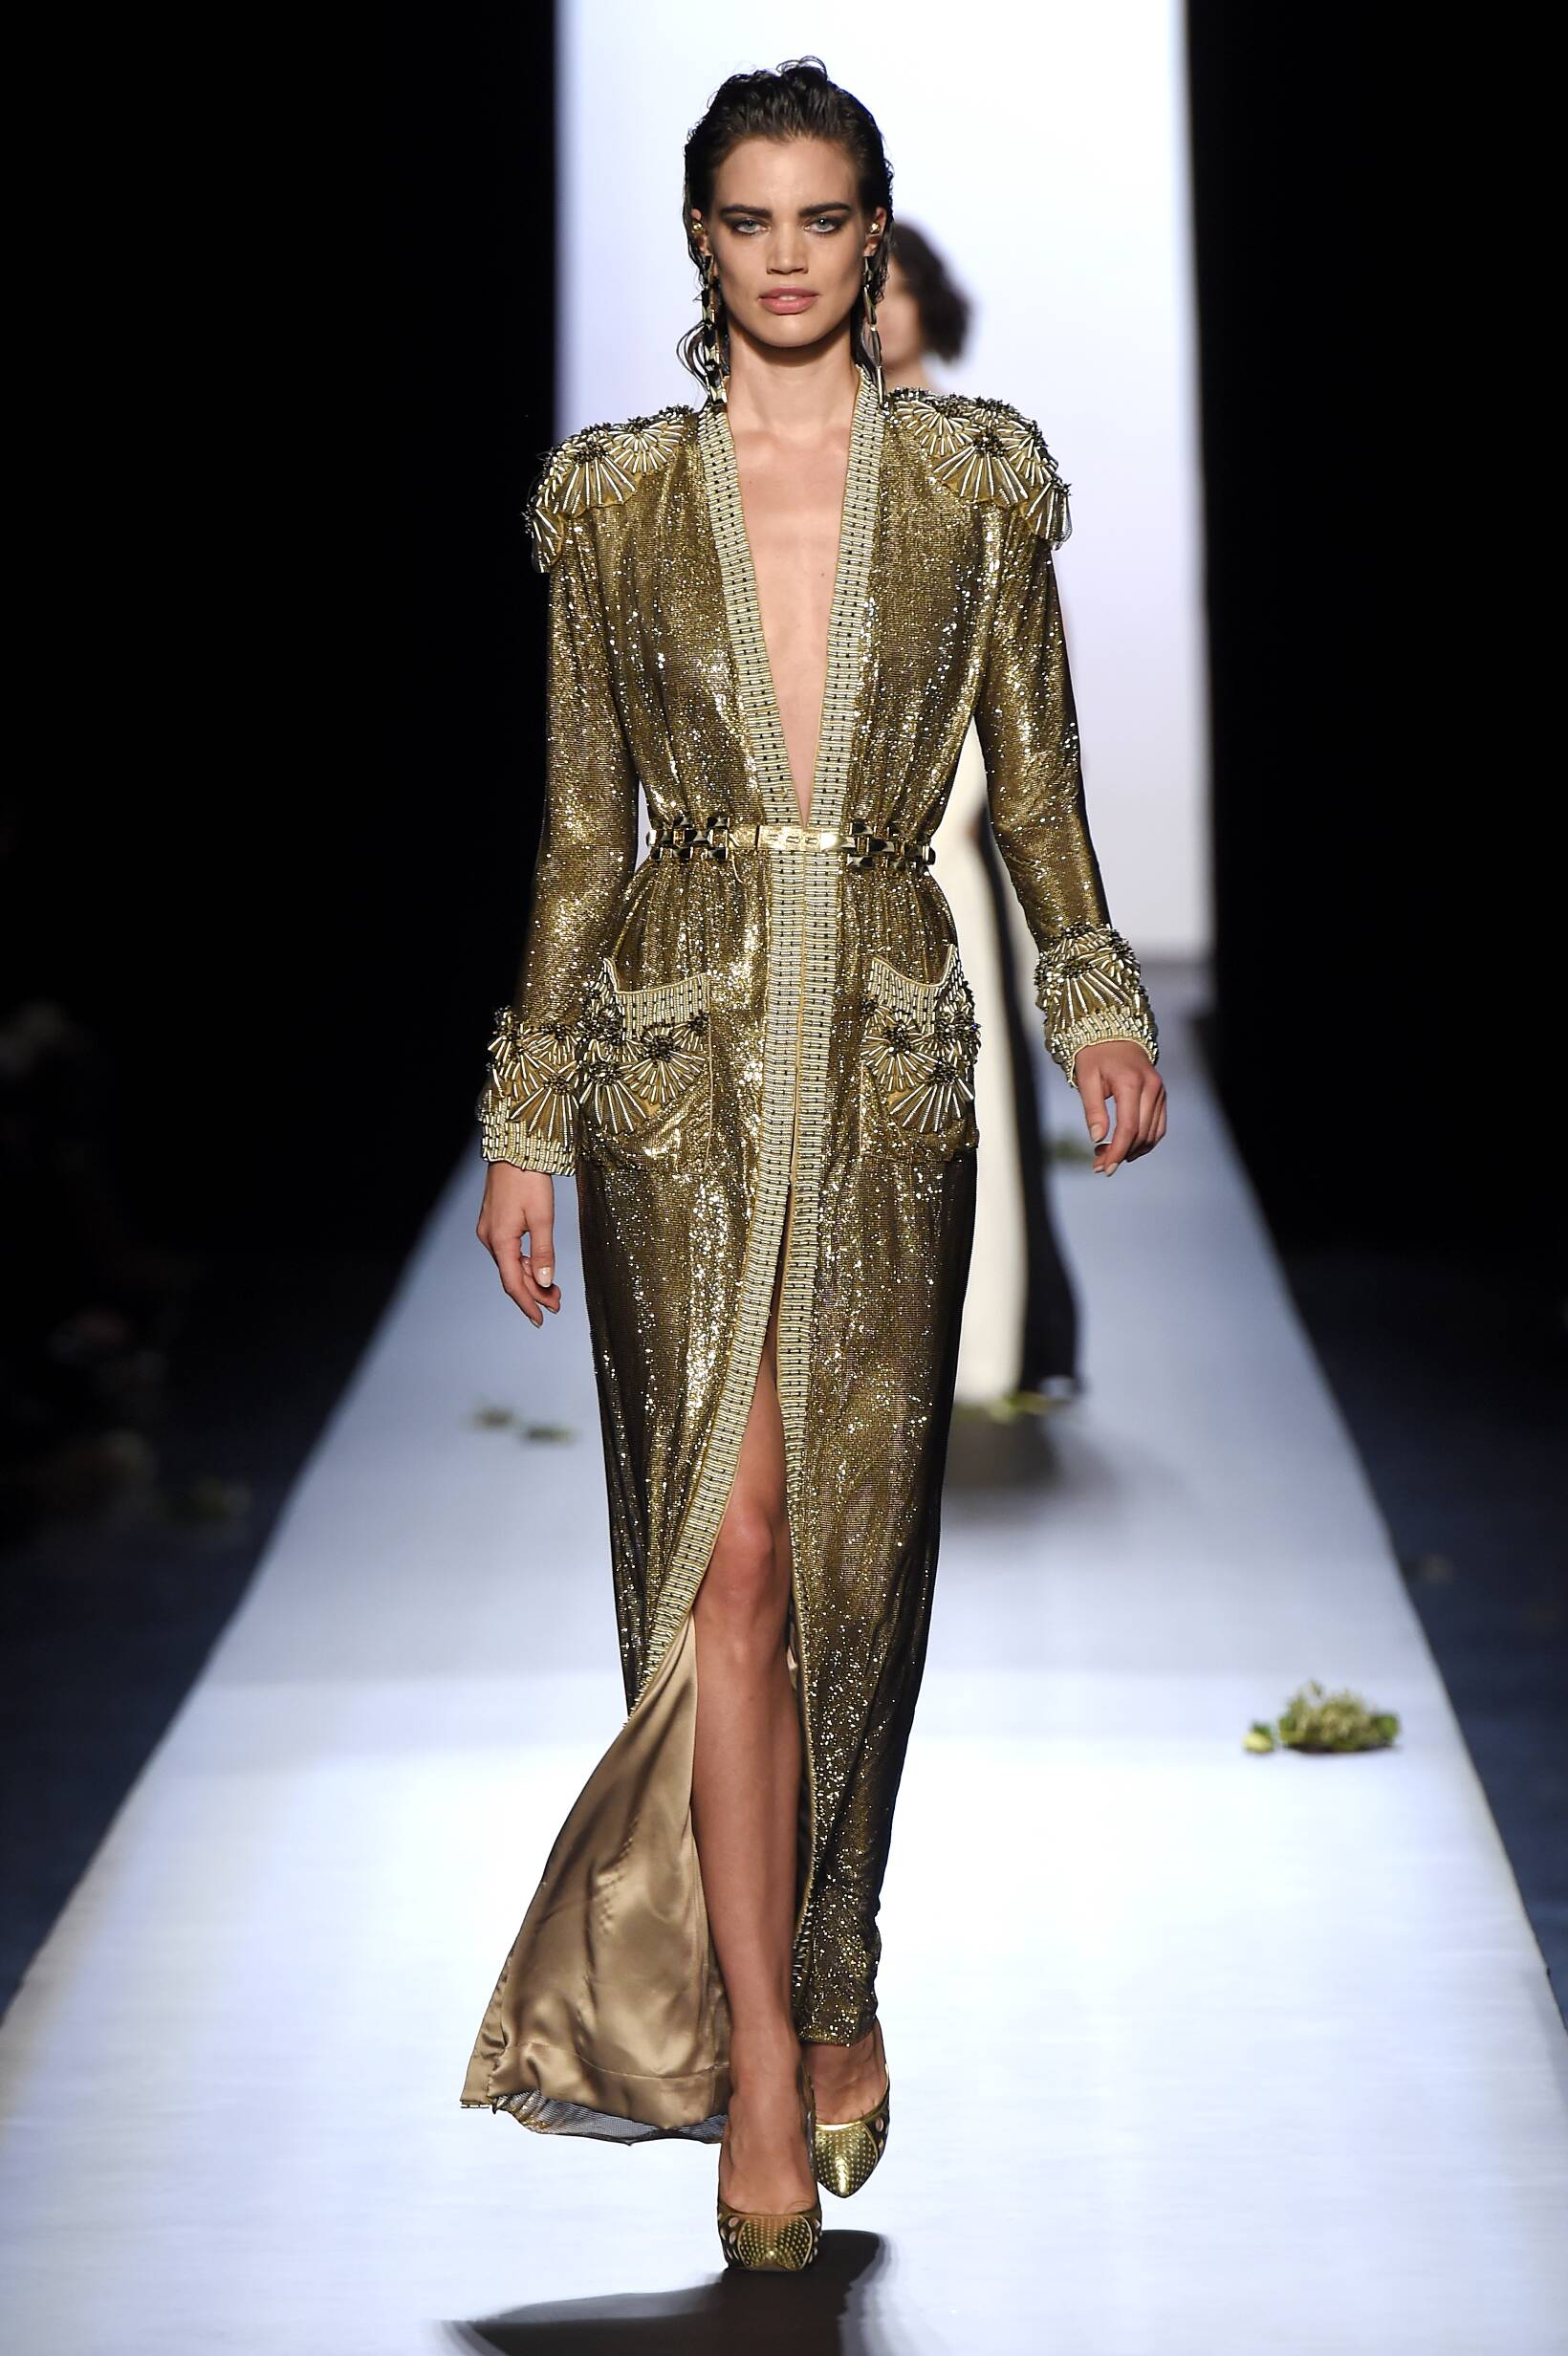 2015 Jean Paul Gaultier Haute Couture Collection Summer Runway